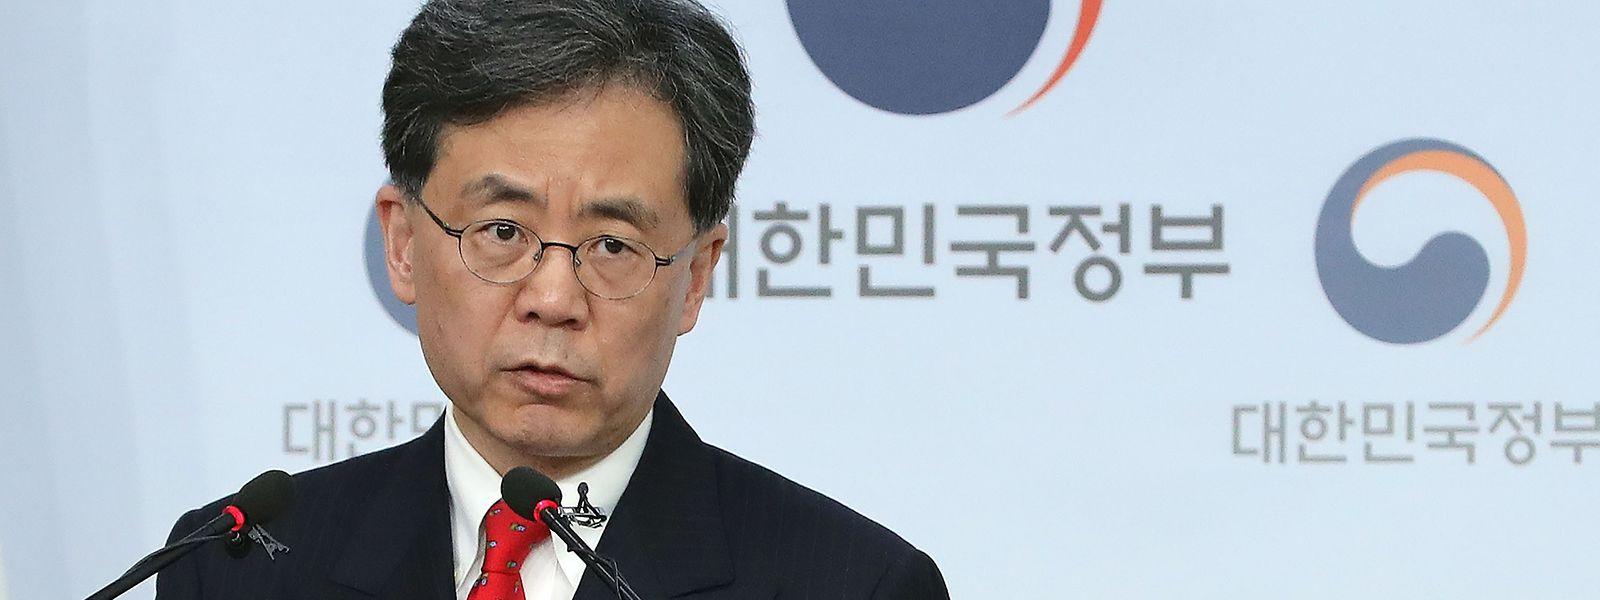 Südkoreas Handelsminister Kim Hyon-chong gab das Abkommen am Montag bekannt.